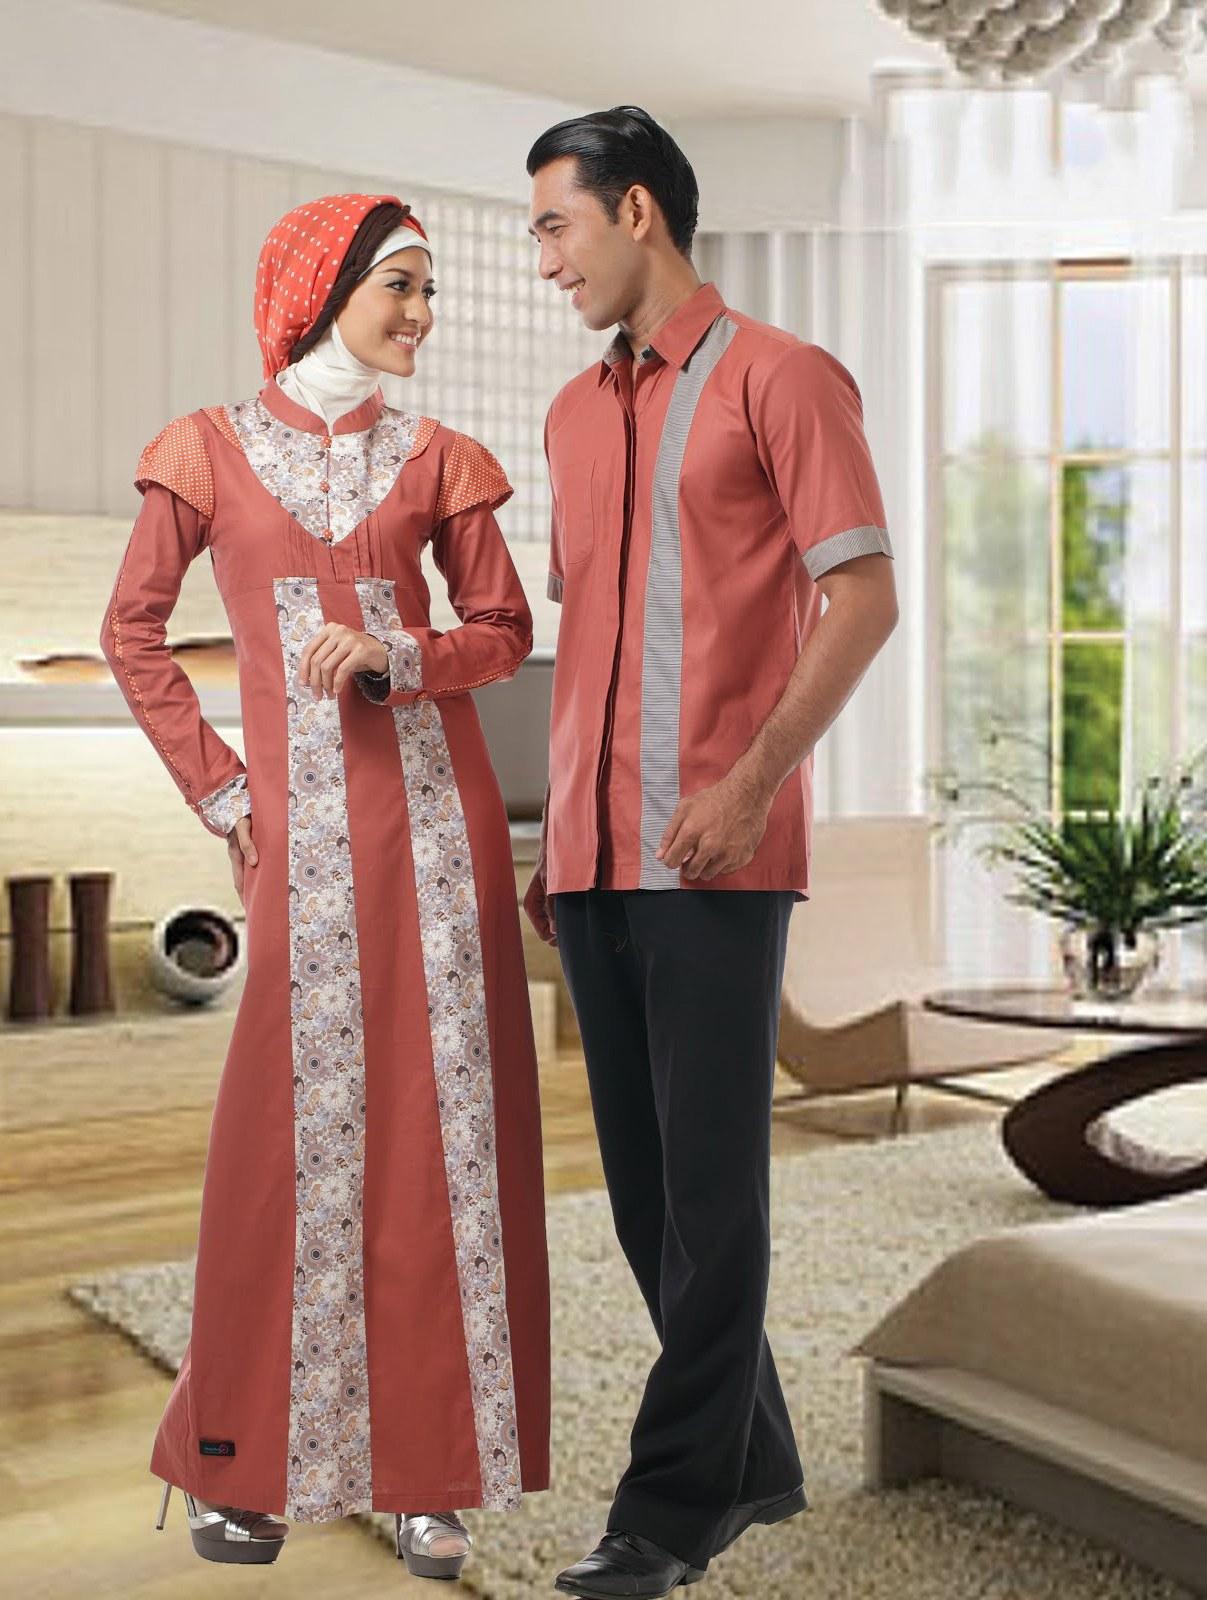 Bentuk Model Baju Lebaran Pria Wddj Trend Model Baju Batik Lebaran Terbaru 2013